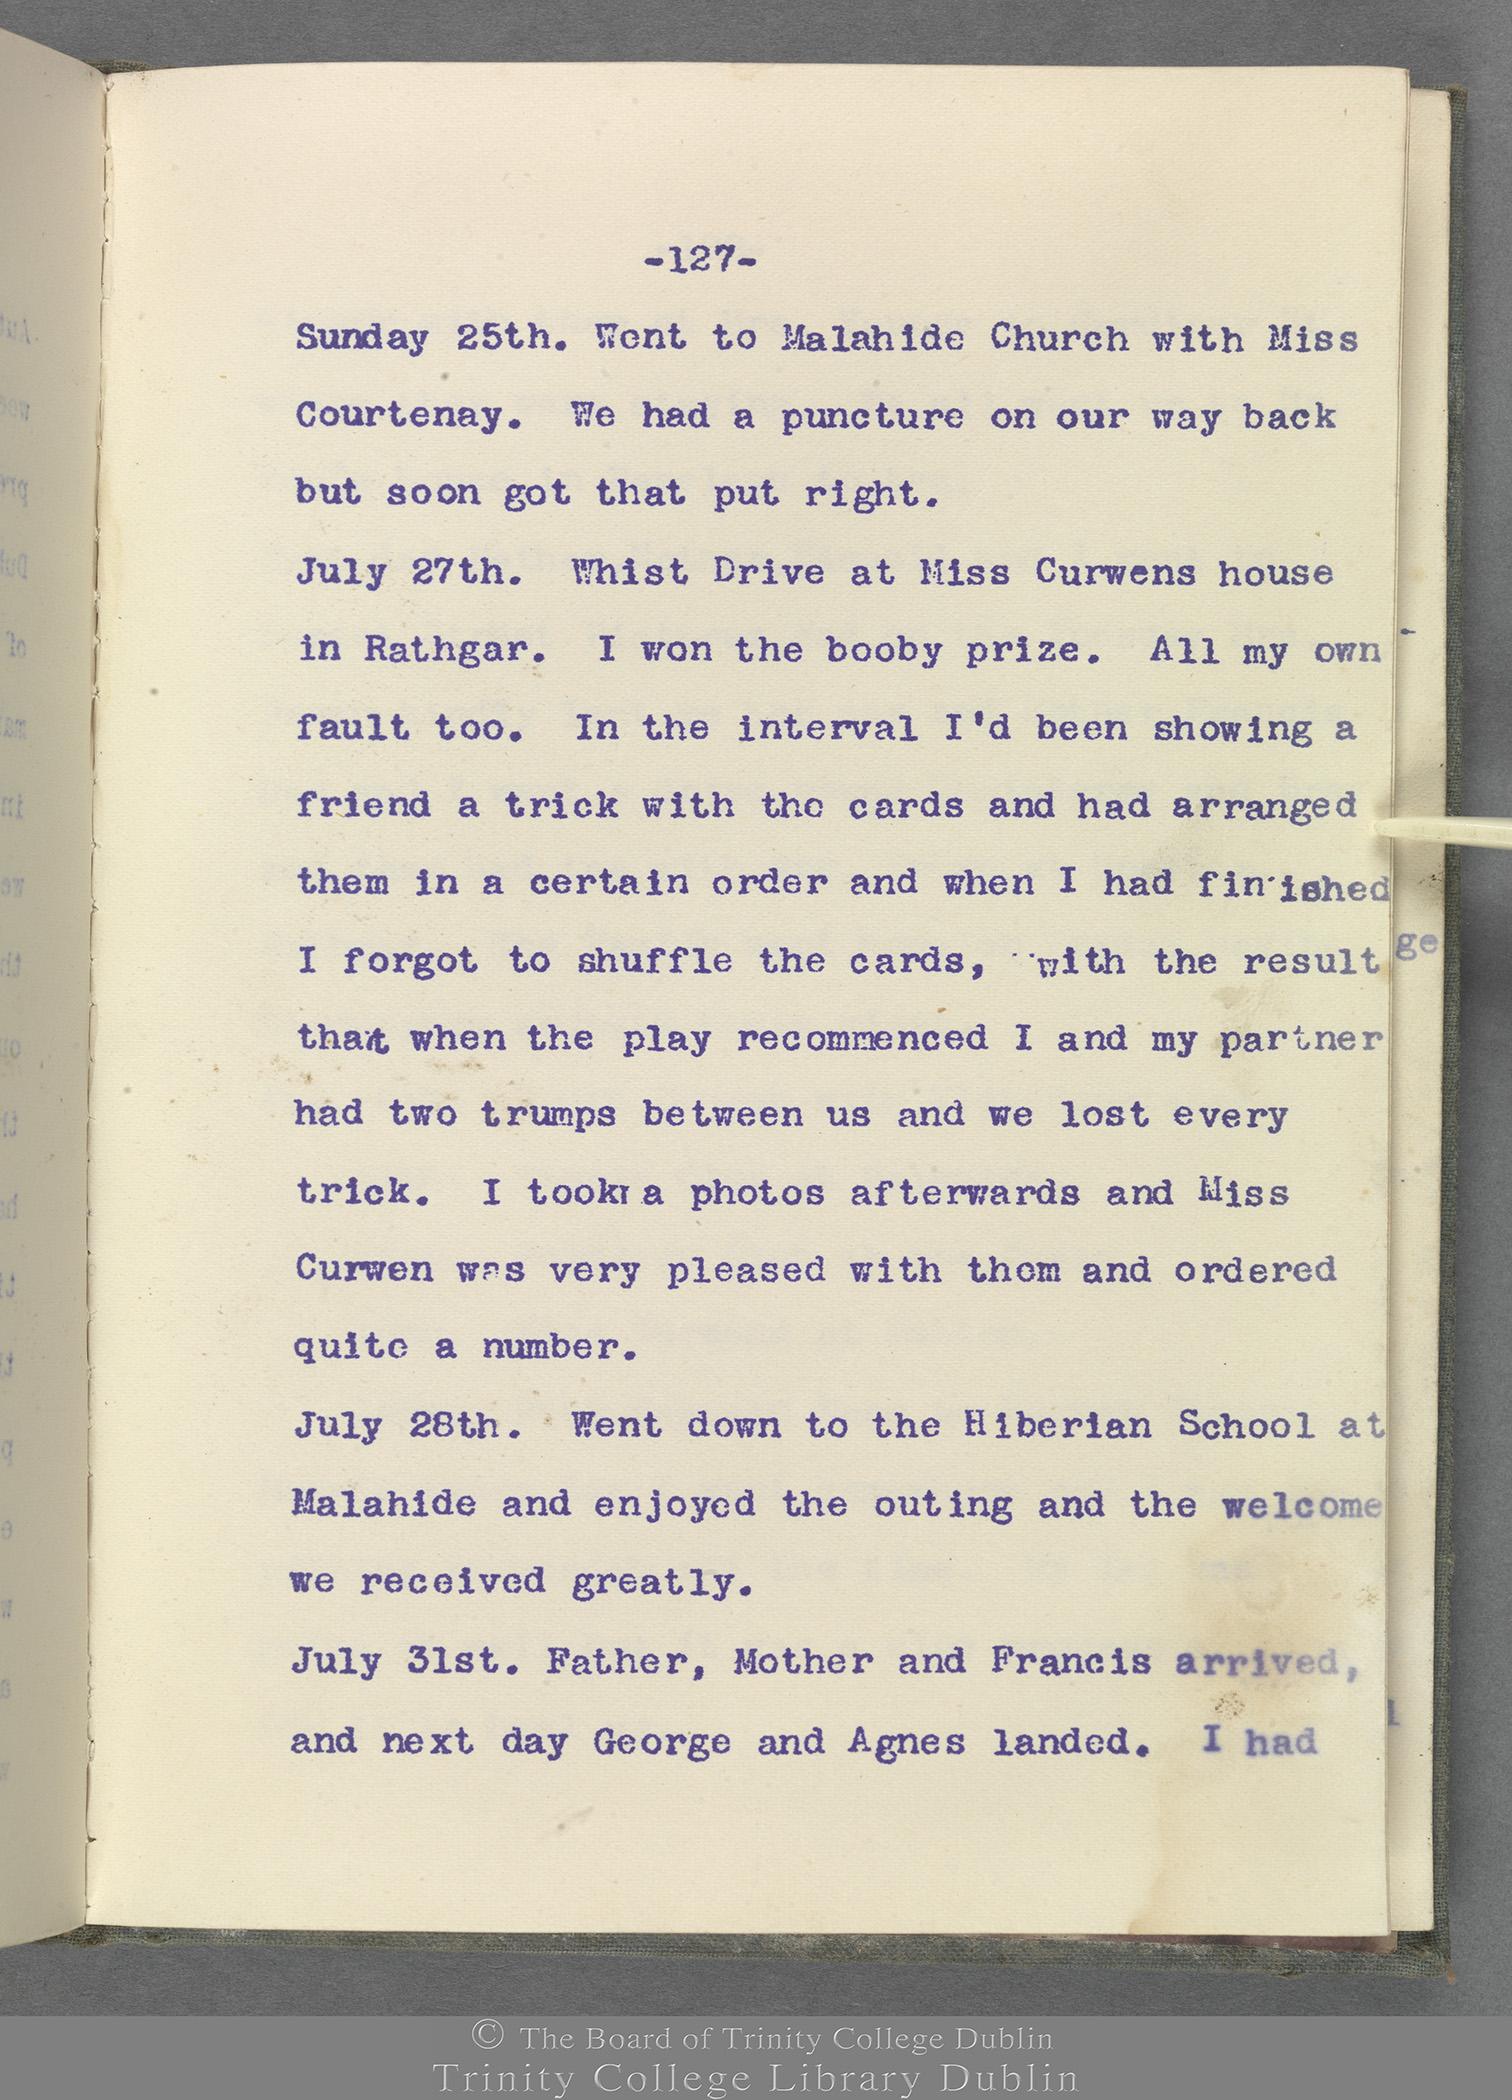 TCD MS 10853 folio 127 recto